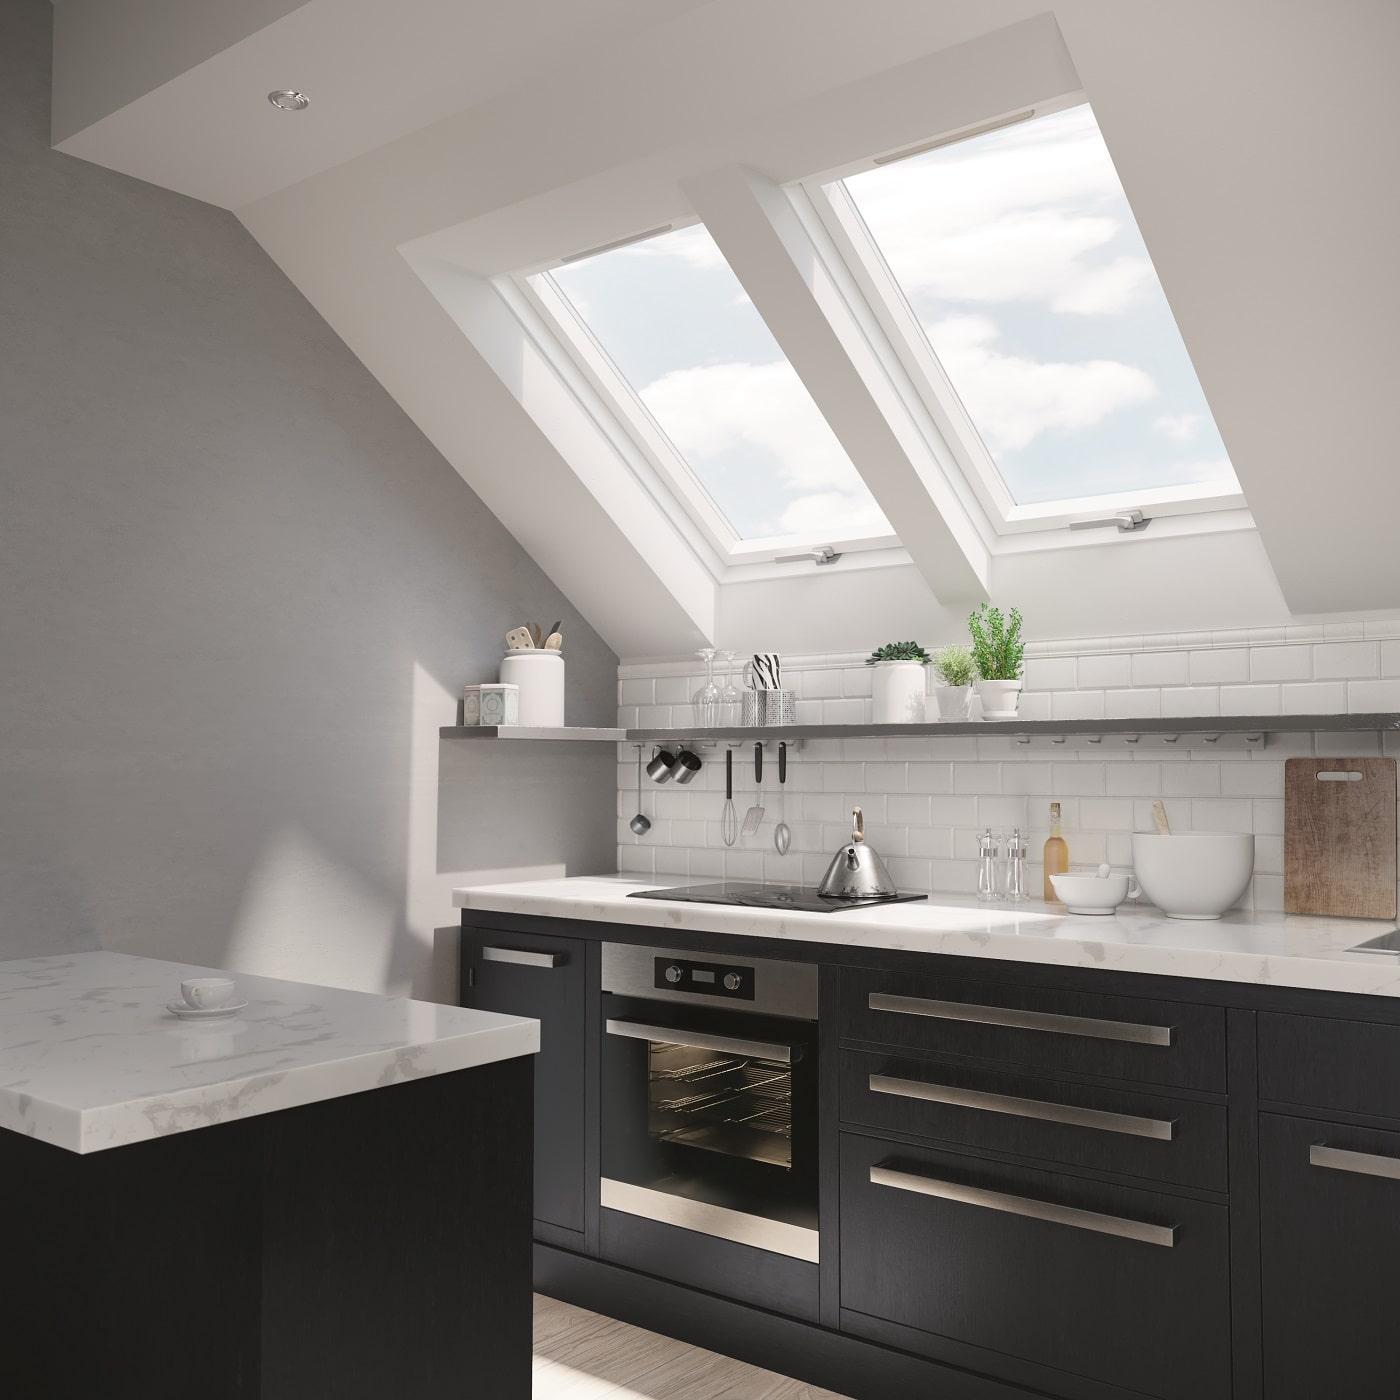 okna dachowe do kuchni